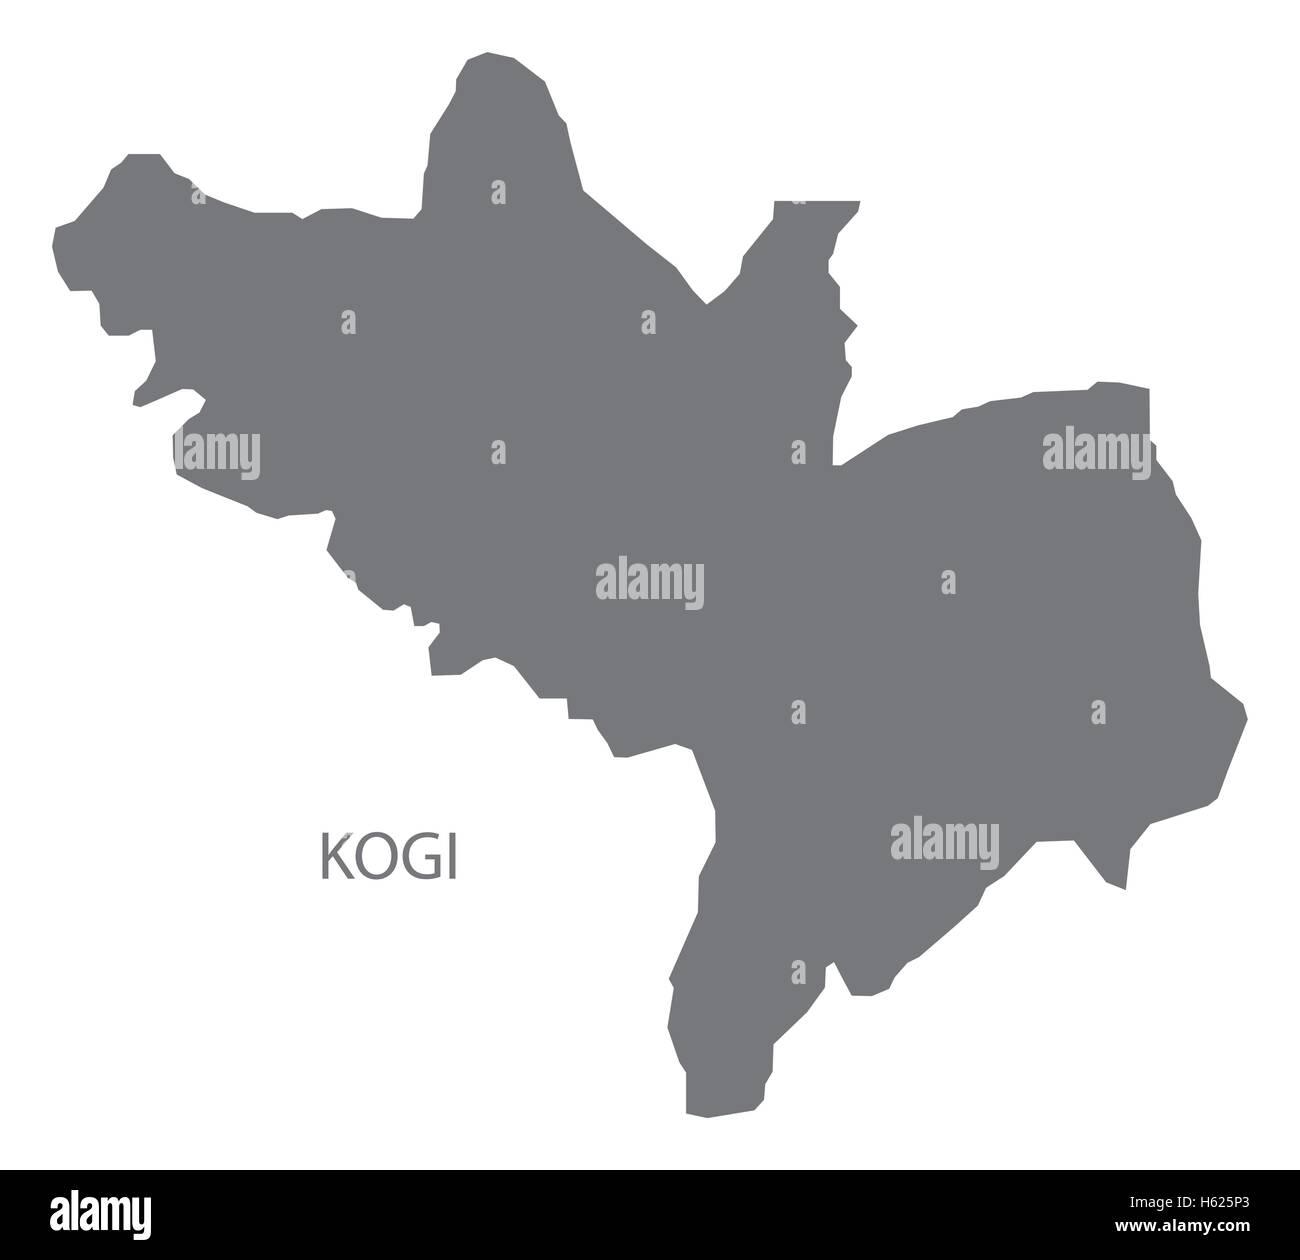 Kogi State Stock Photos & Kogi State Stock Images - Alamy on adamawa state map, oyo state map, niger state, akwa ibom, ekiti state, bayelsa state map, ekiti state map, edo state map, ondo state, ogun state, osun state map, benue state map, osun state, kaduna state, katsina state map, cross river state, lagos state, alabama state map, taraba state, benue state, ebonyi state map, imo state map, amazonas state map, abia state map, jharkhand state map, imo state, oyo state, kwara state map, anambra state, edo state, ogun state map, california state map, rivers state, delta state, abia state, lagos state map, enugu state, kano state, borno state map, anambra state map,